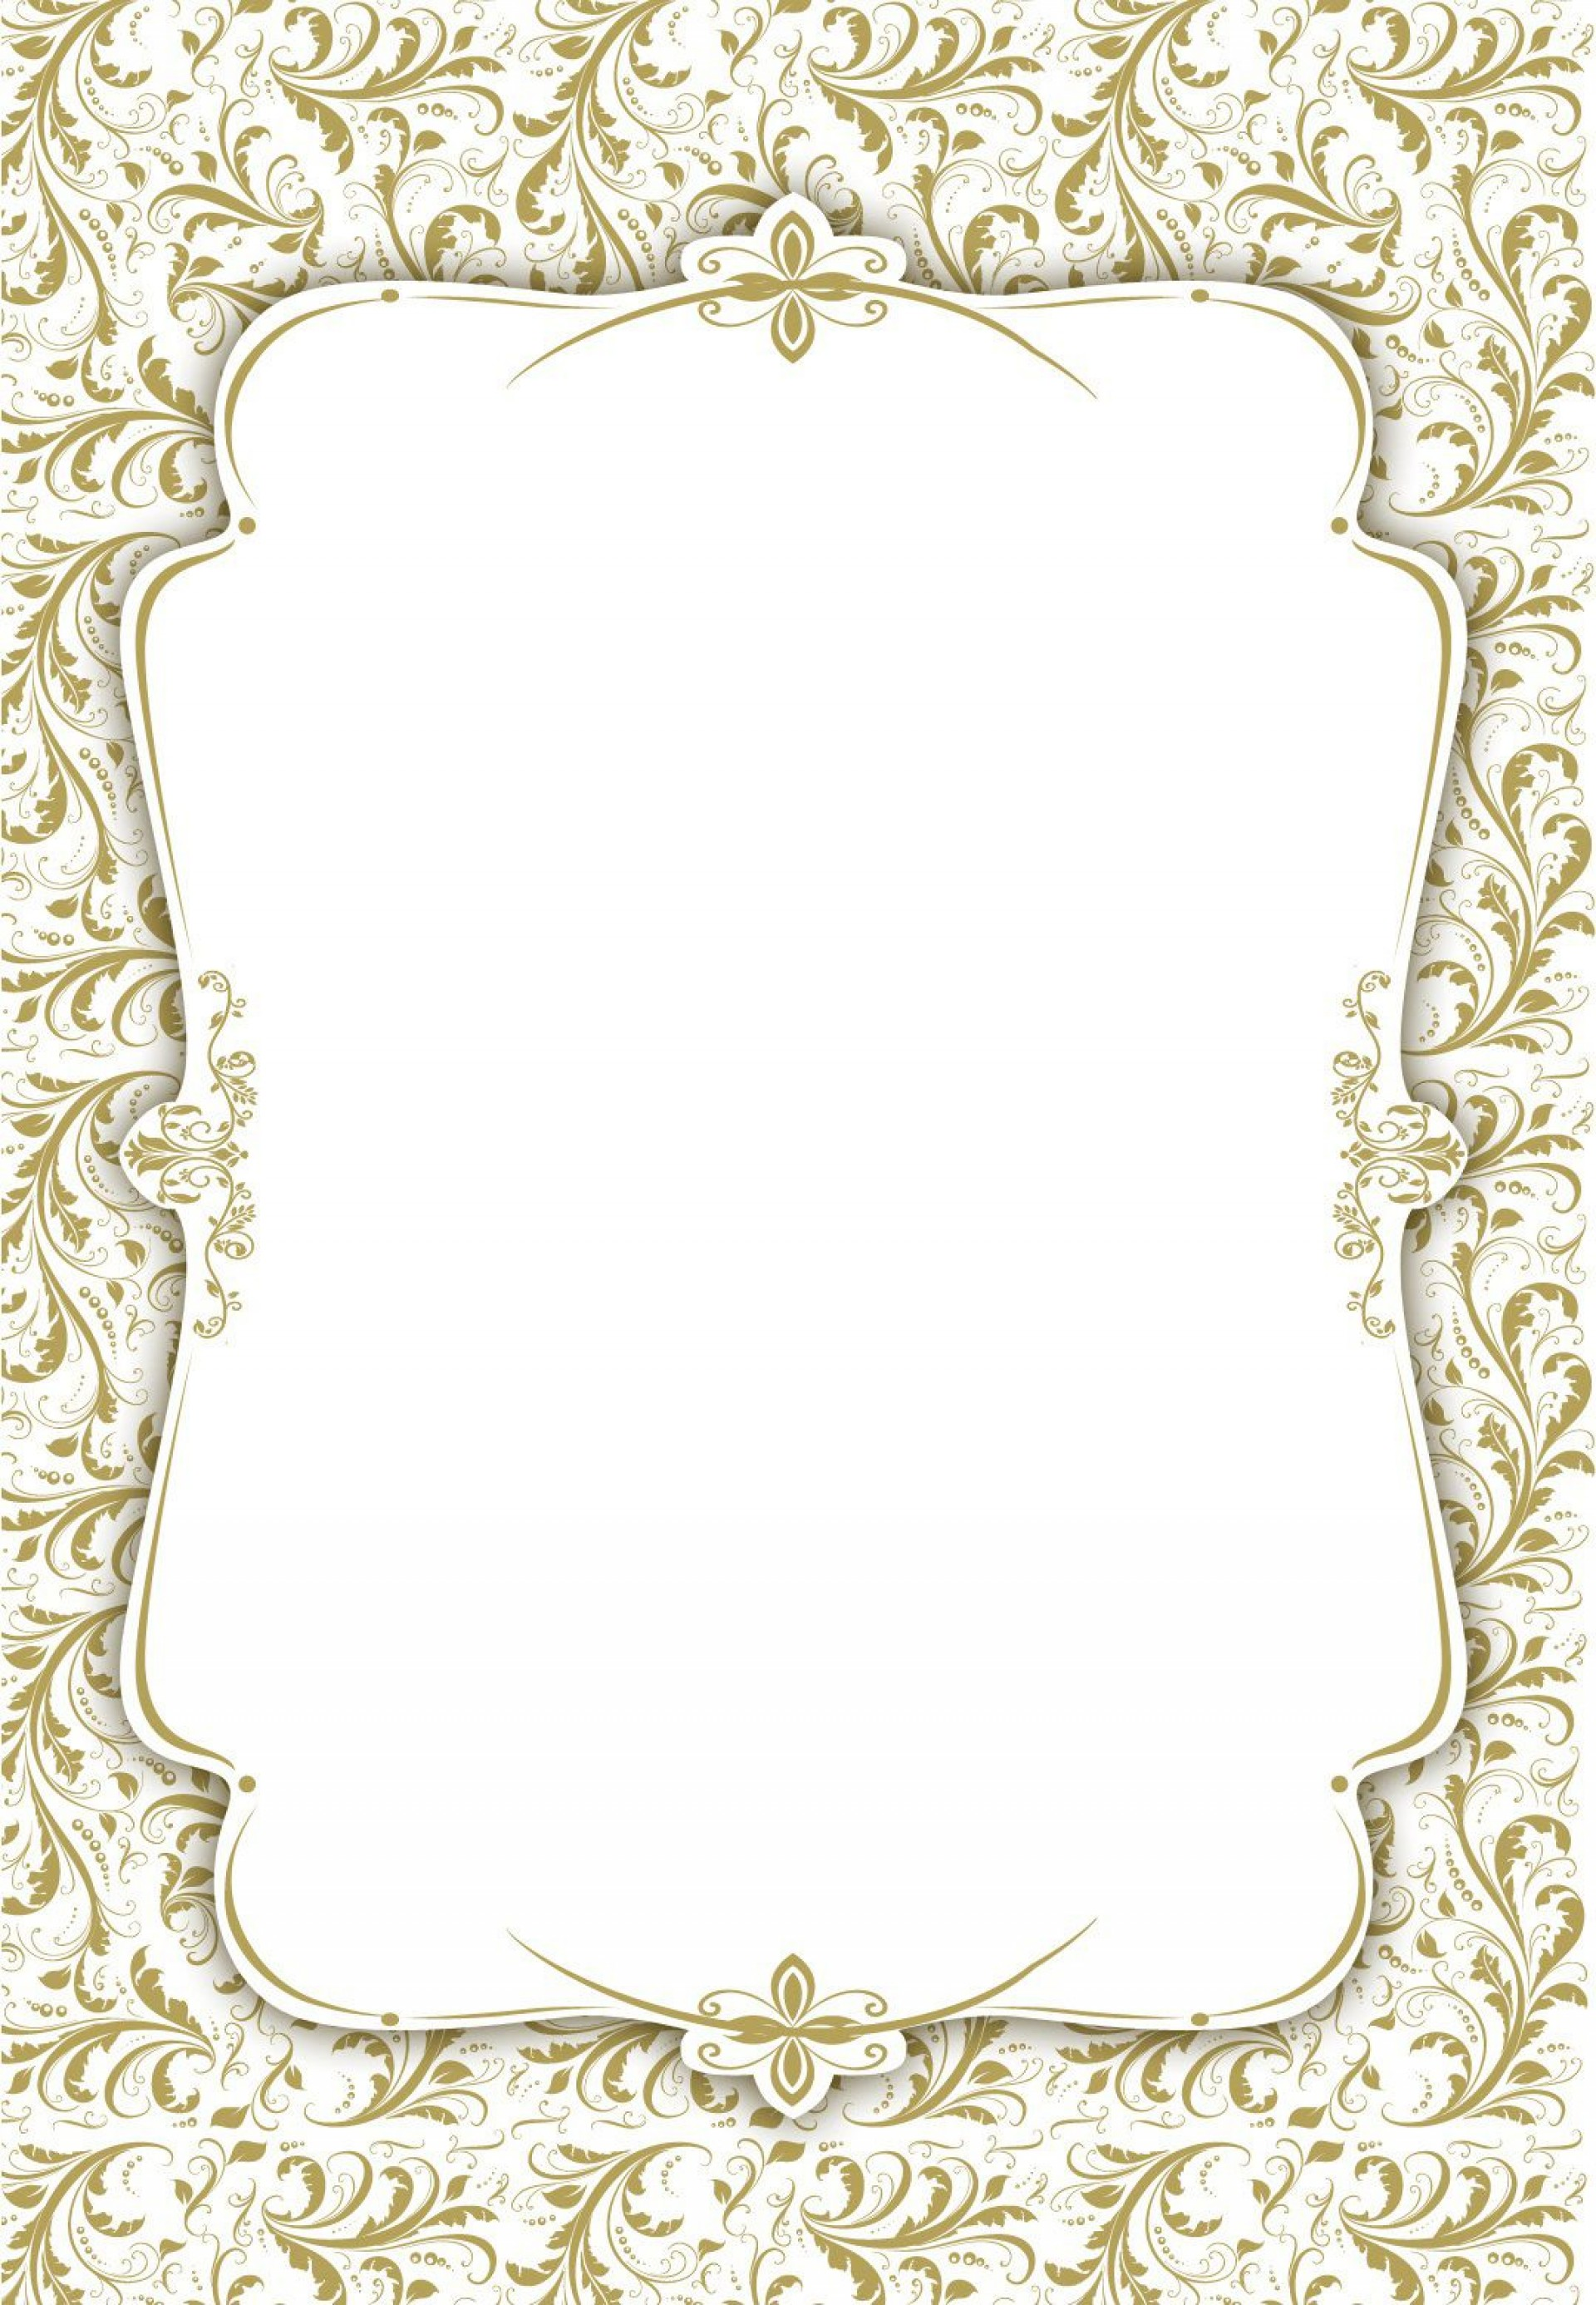 003 Stunning Blank Wedding Invitation Template Idea  Templates Free Download Printable Royal Blue1920